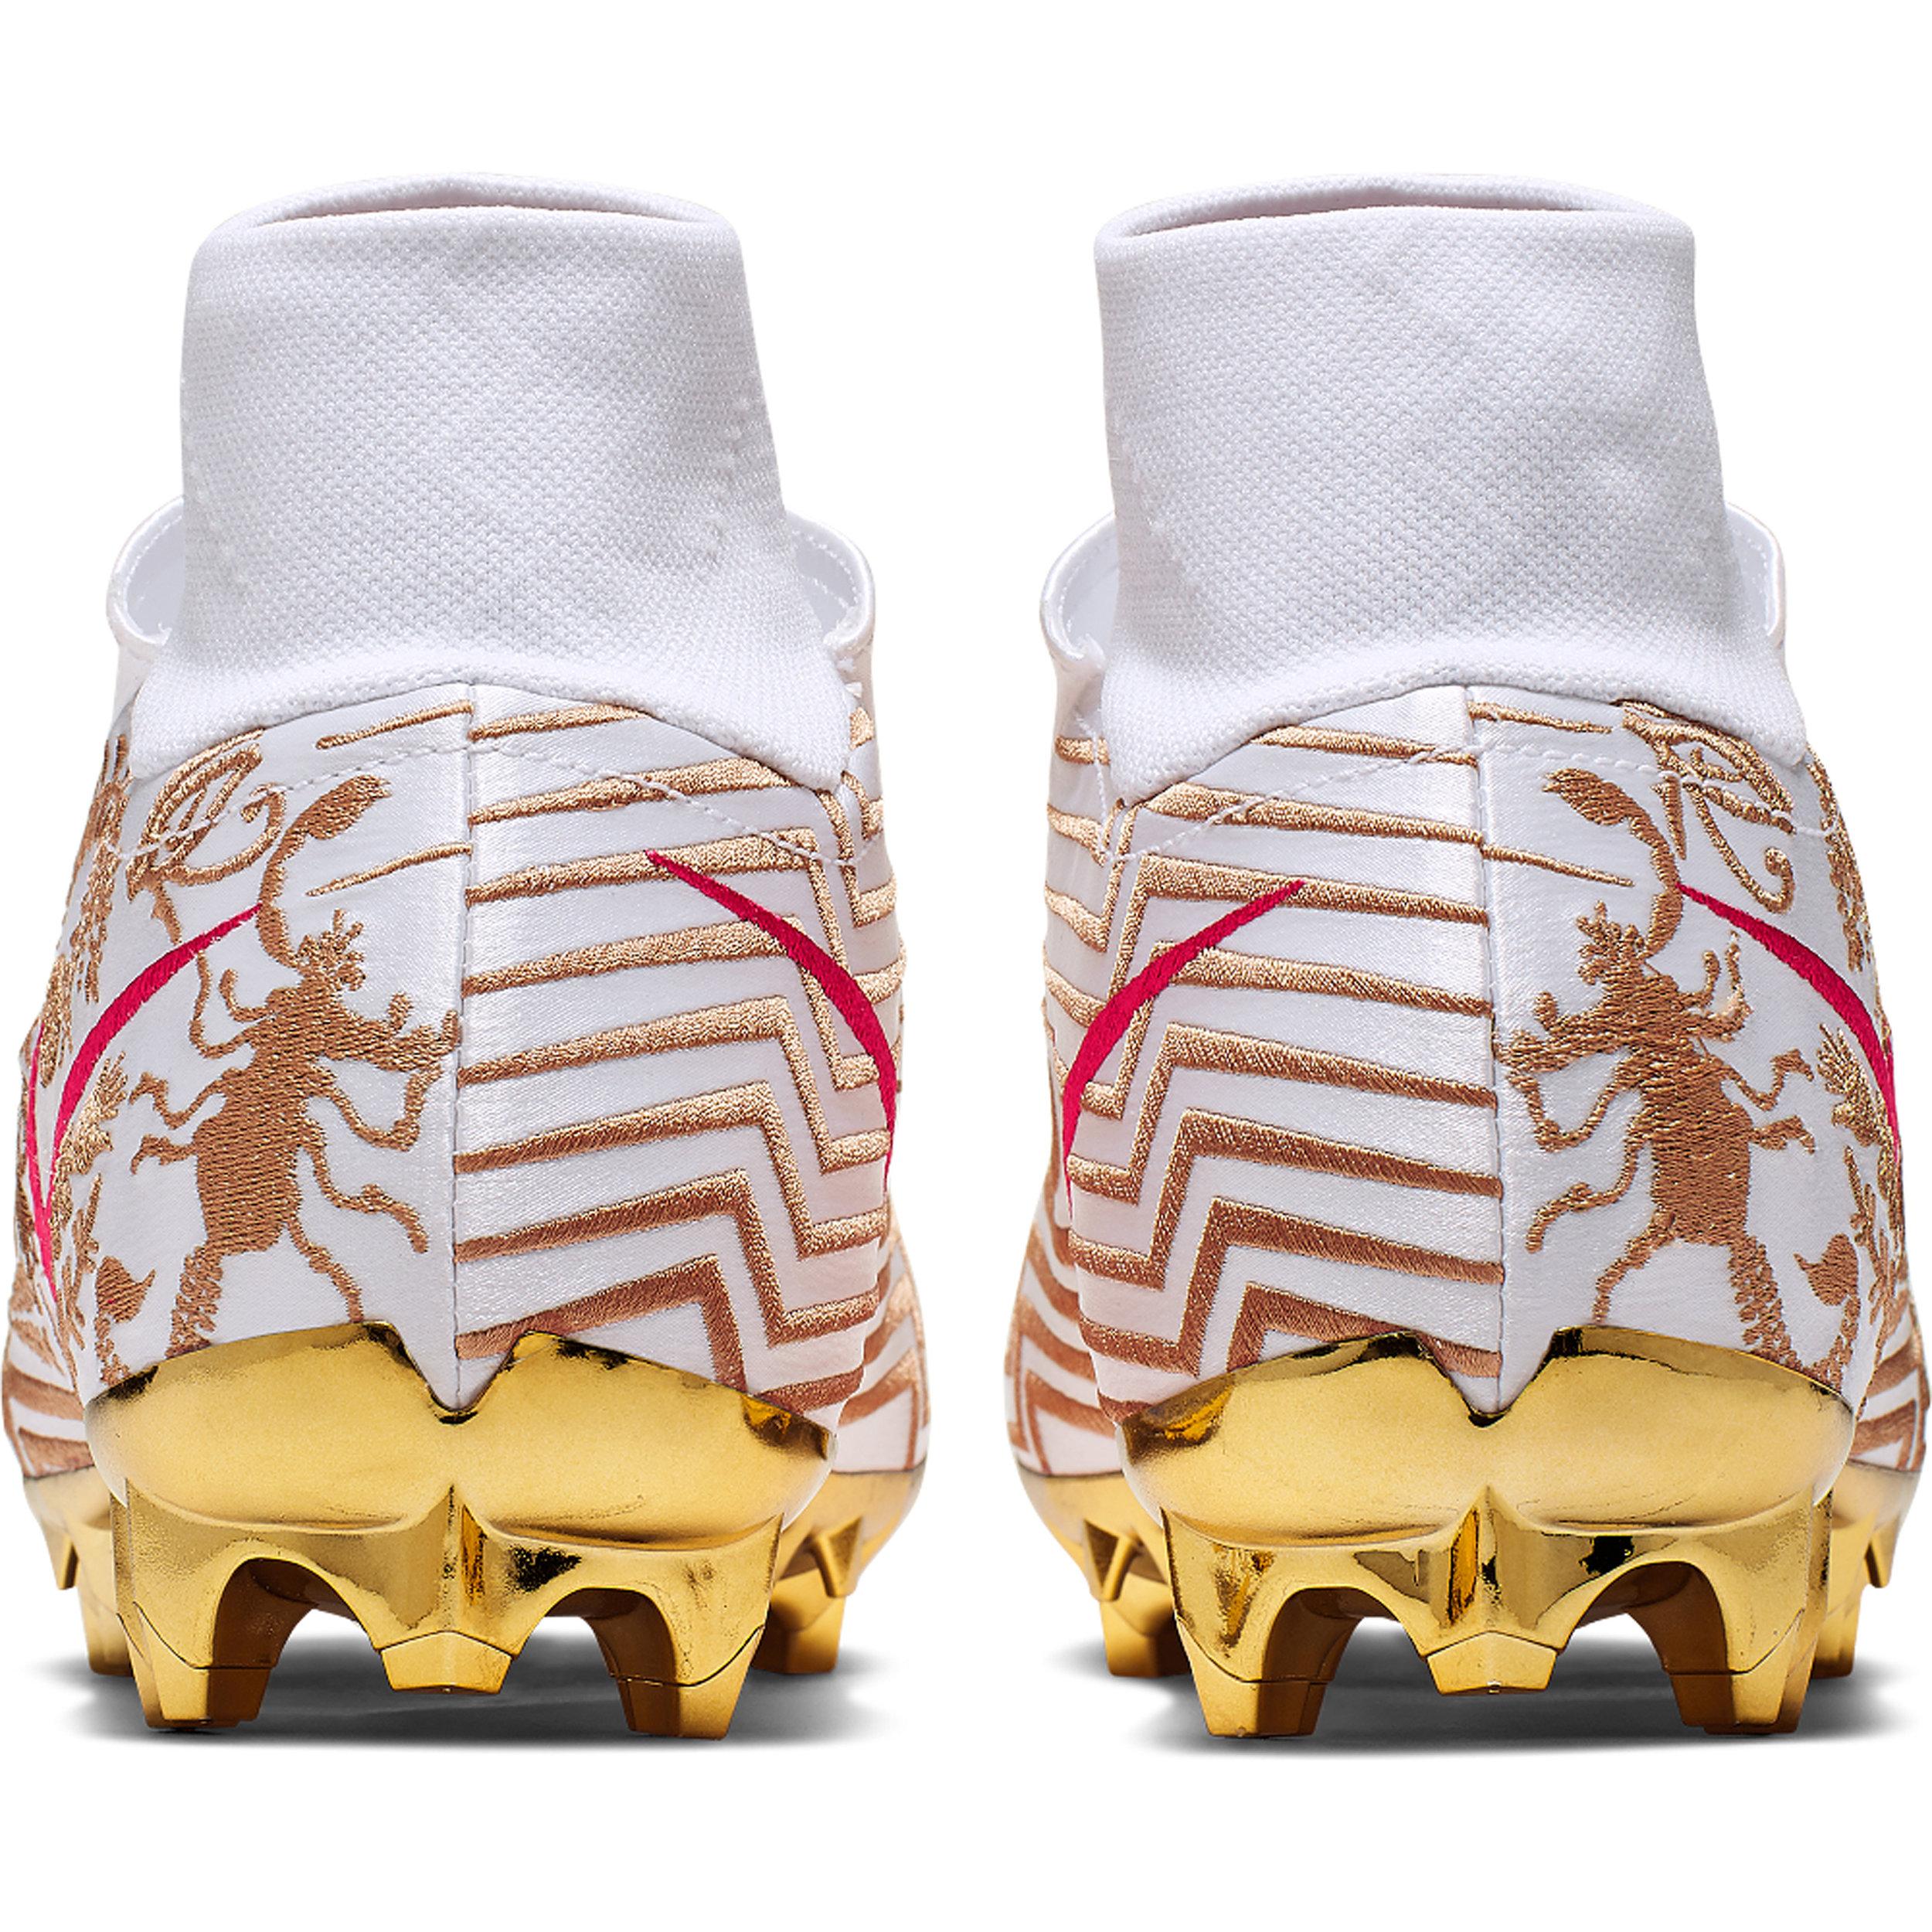 NikeNews_NikeVaporUntouchablePro3_OBJ_01_89284.jpg